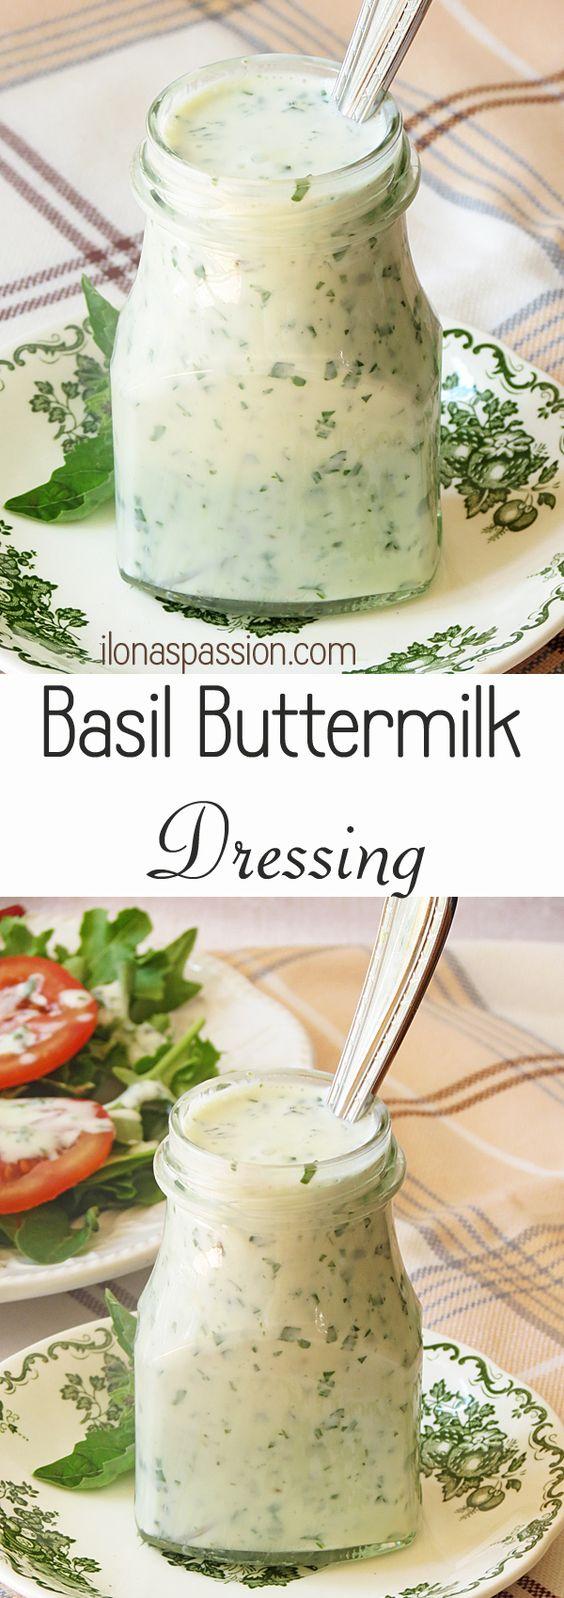 Healthy Basil Buttermilk Dressing by ilonaspassion.com #basil #dressing #buttermilk #healthy